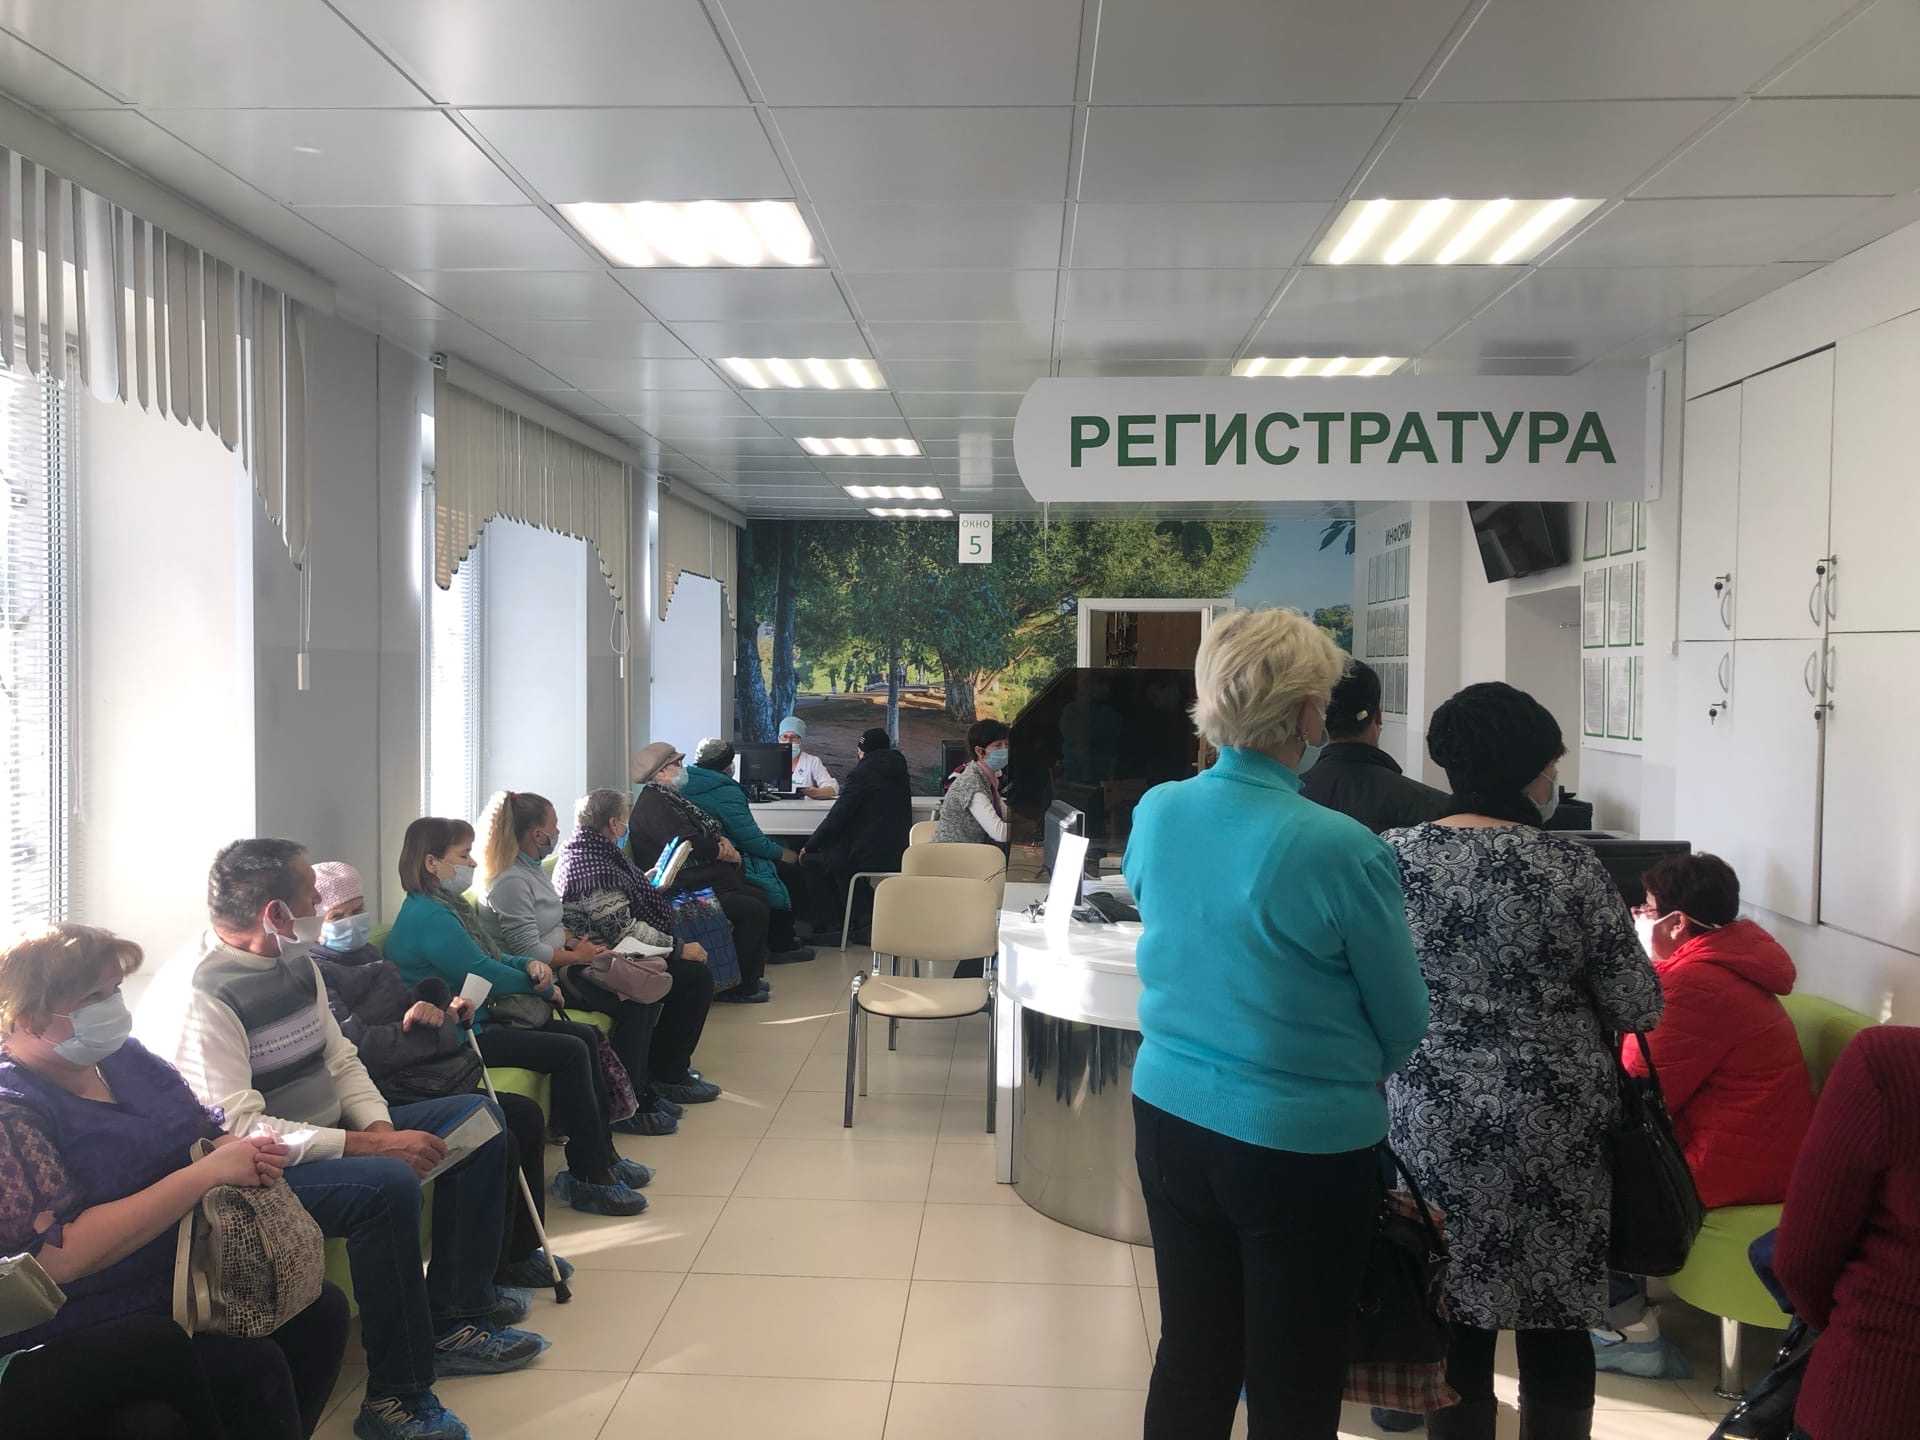 За сутки коронавирусом в Кирово-Чепецке заболели 24 человека